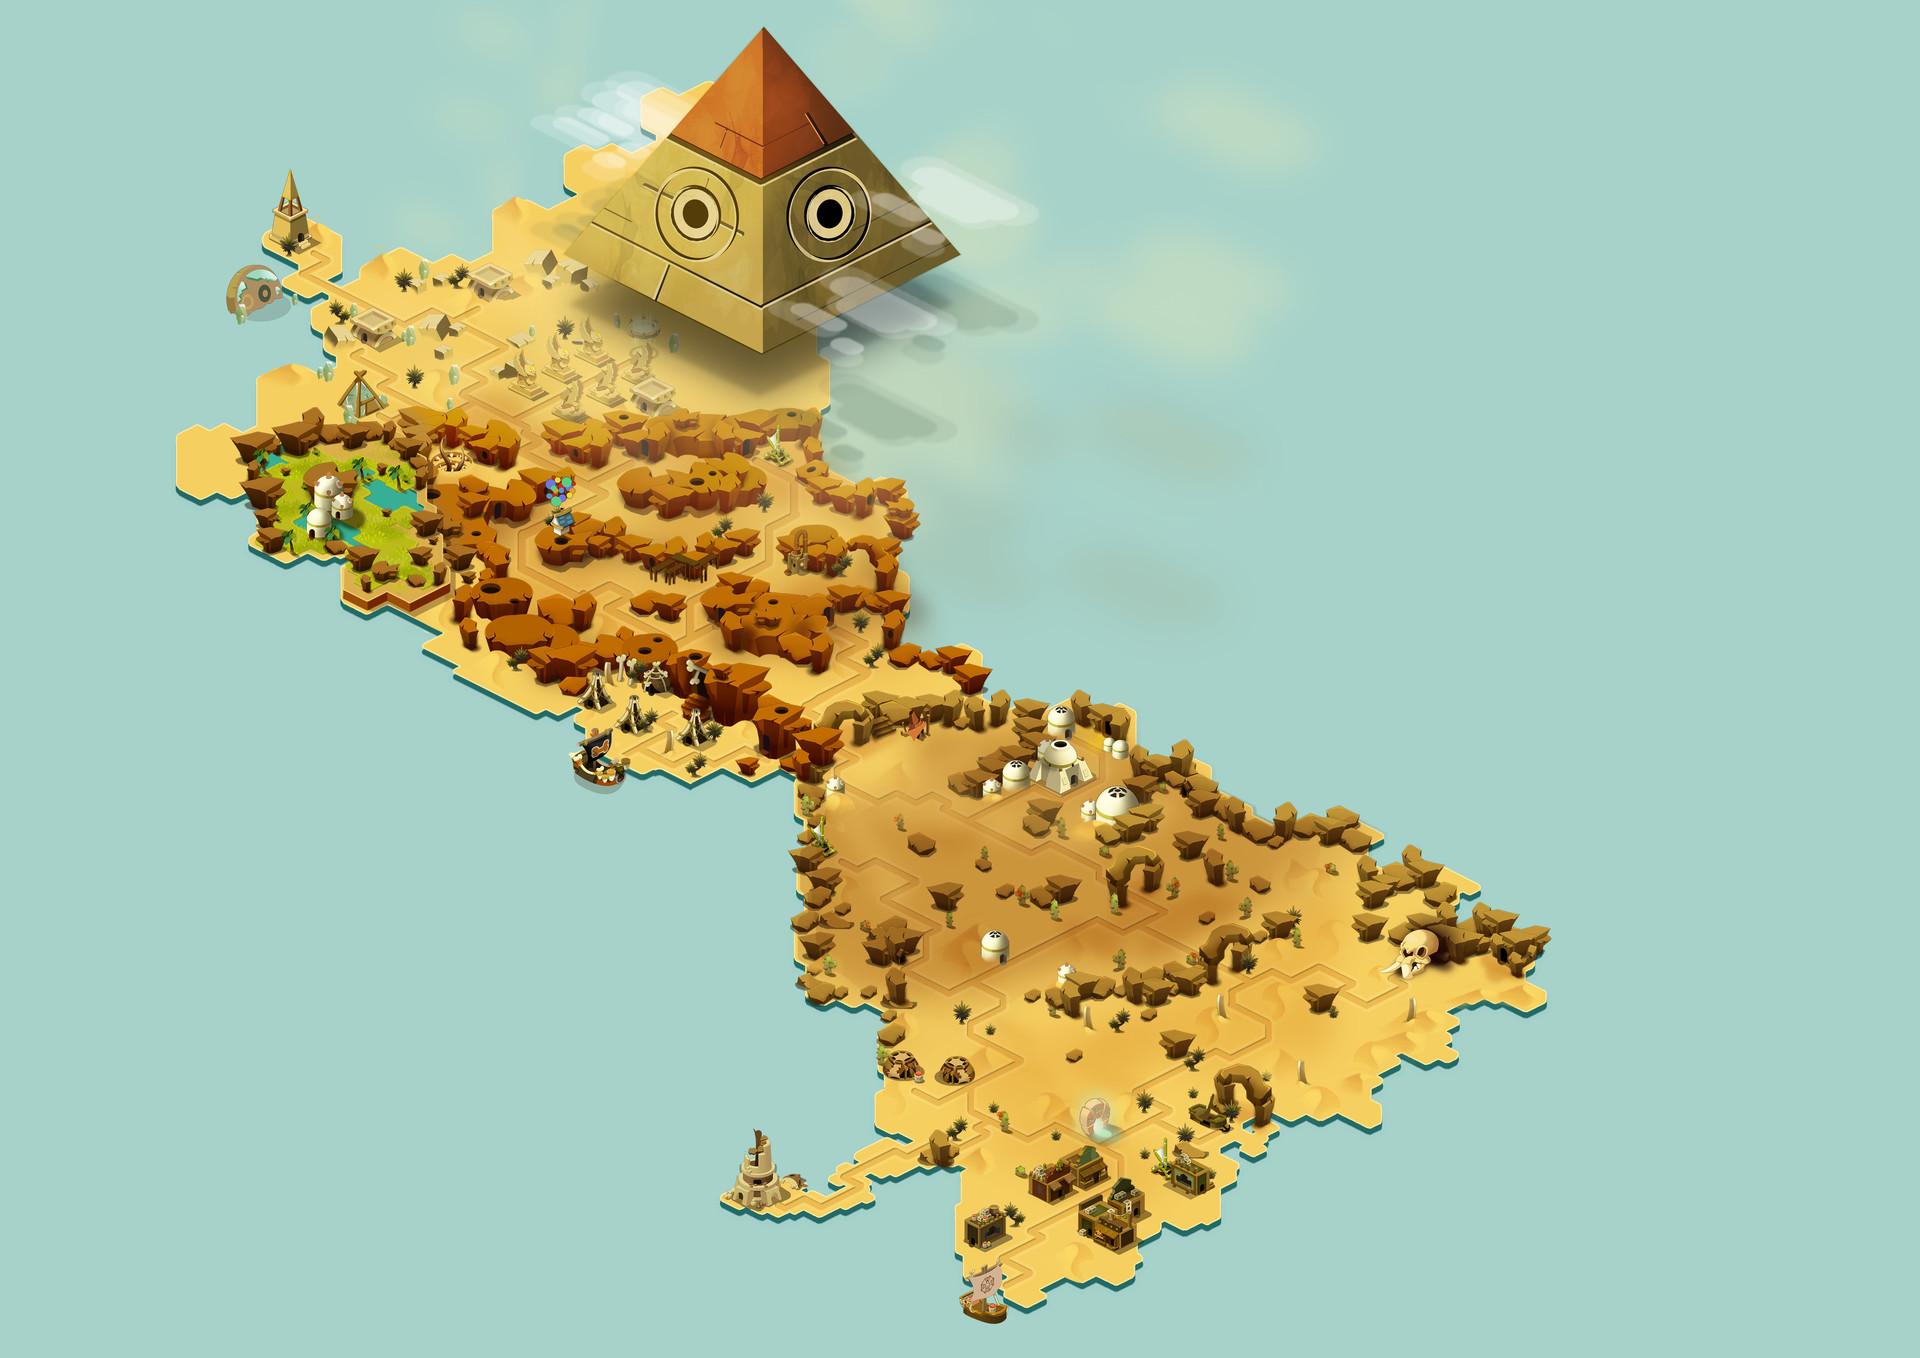 ArtStation - Dofus - World Map Samples, Véronique Guannel